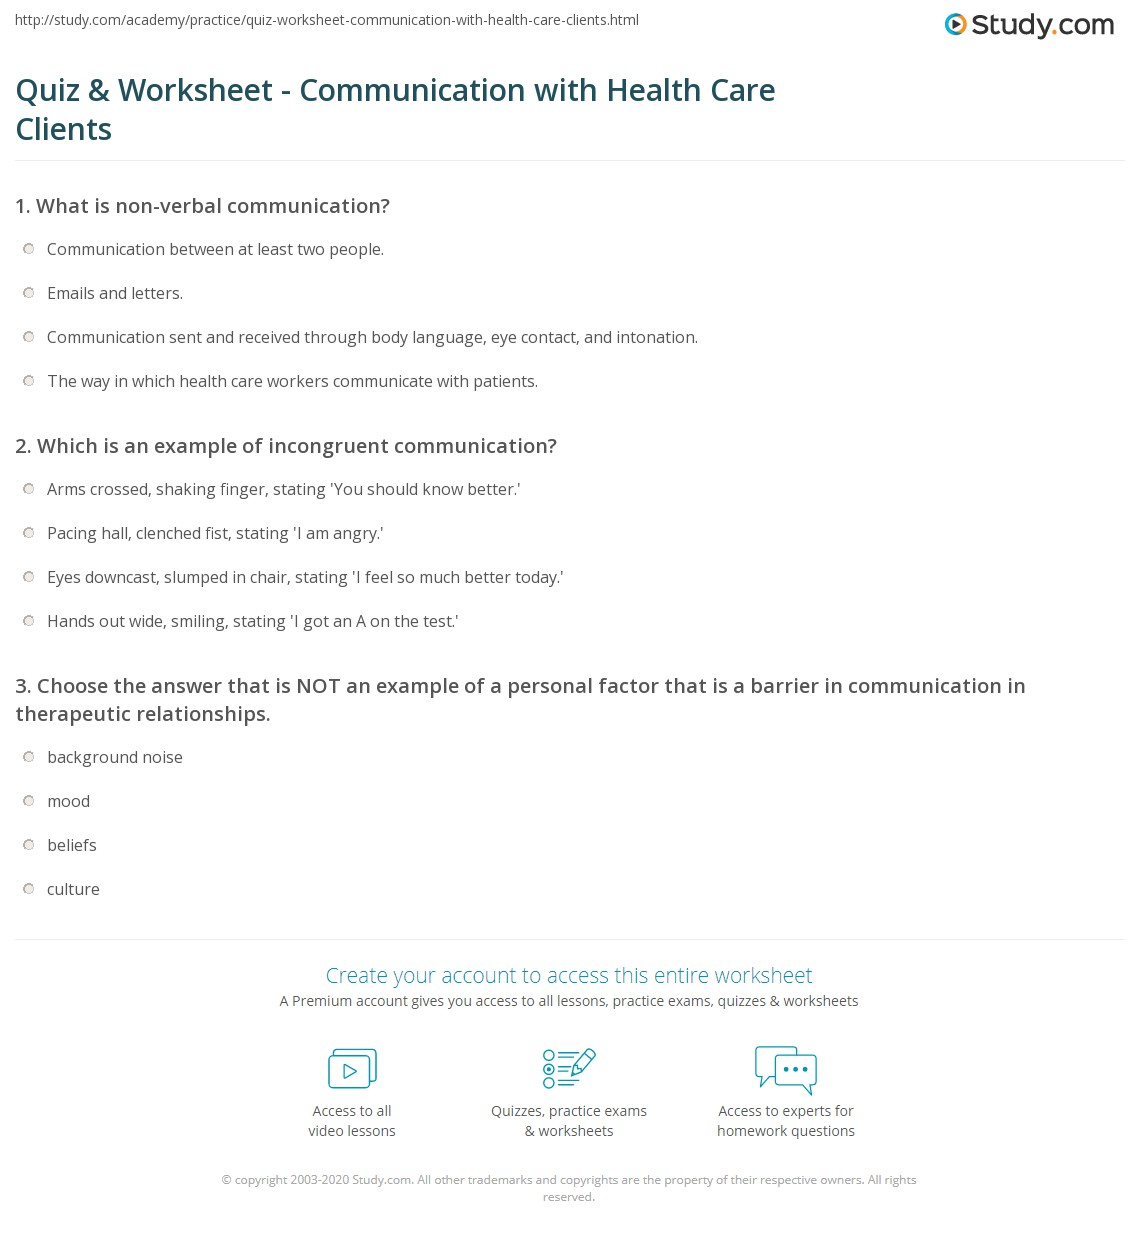 worksheet Health Worksheet quiz worksheet communication with health care clients study com print between patients workers worksheet